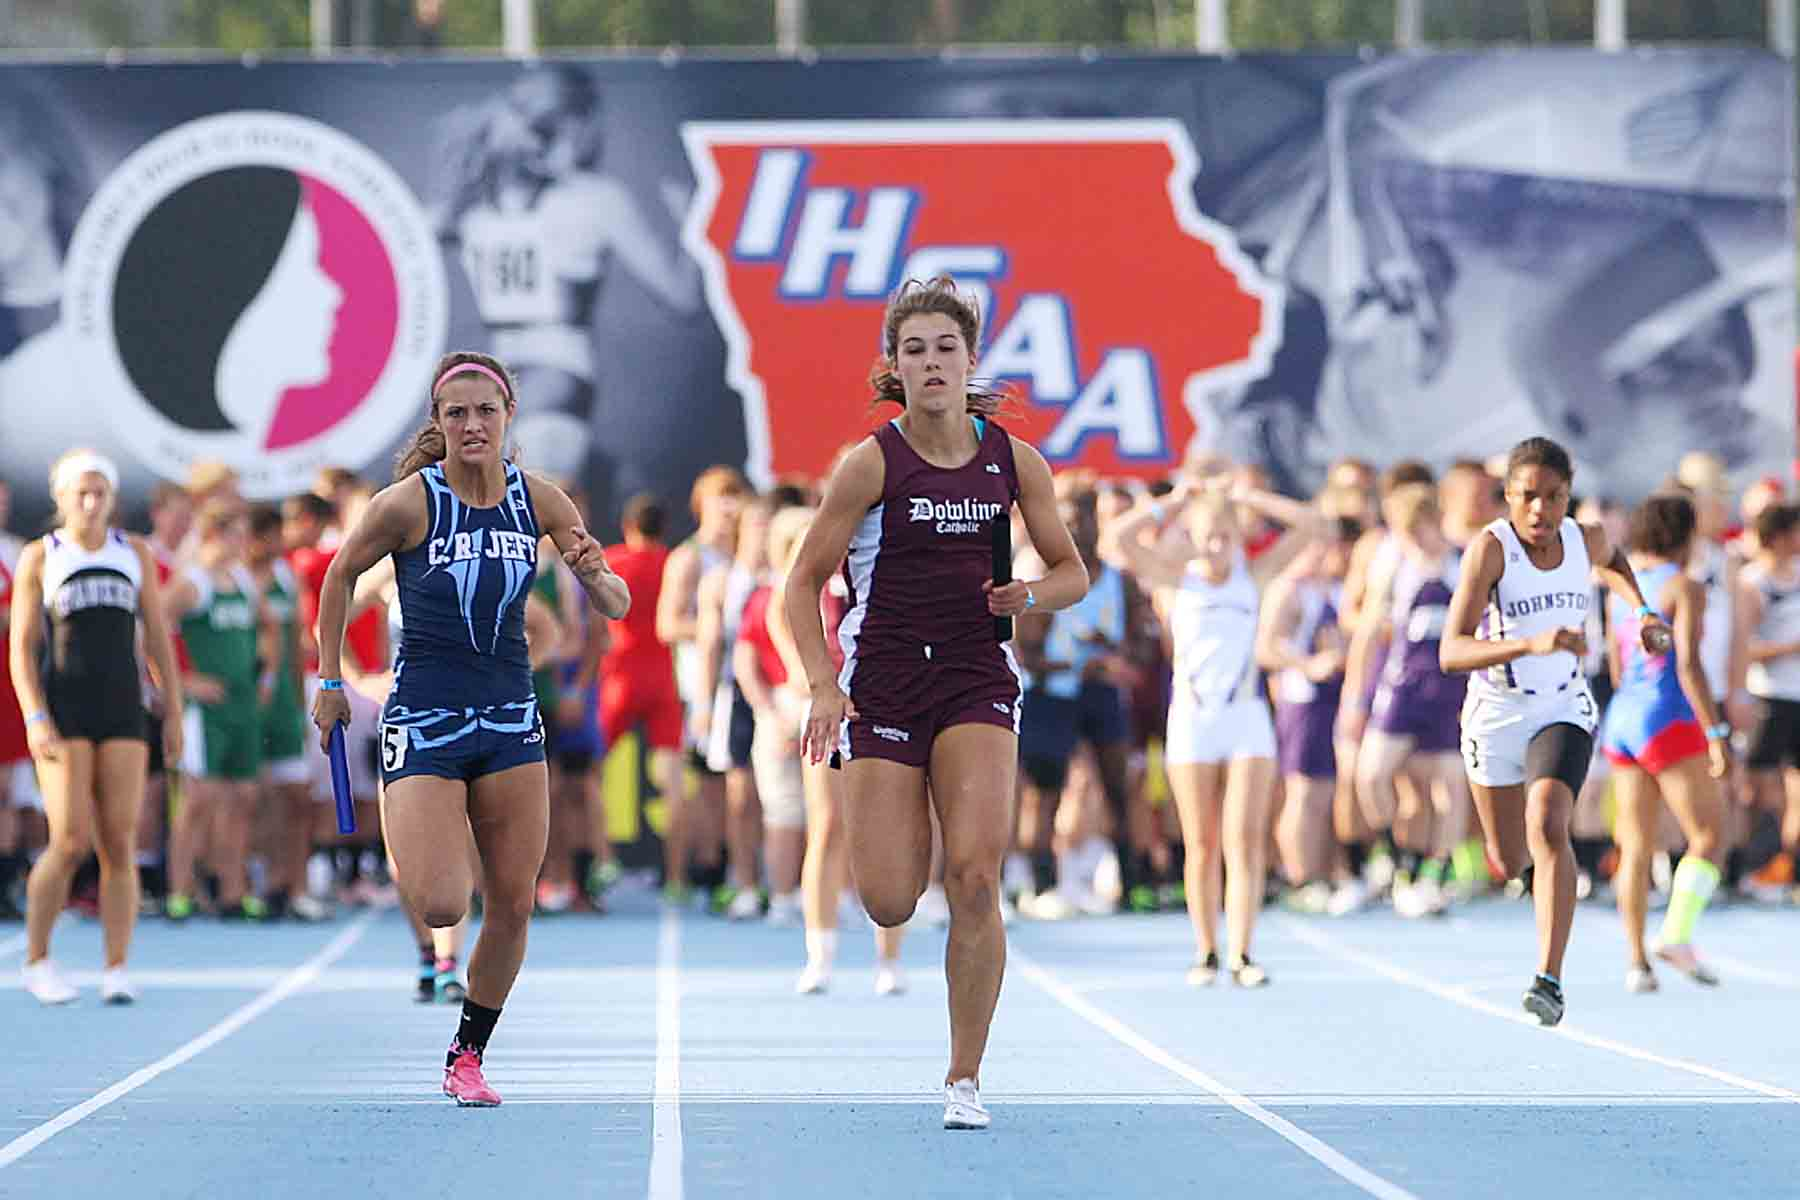 2017 Iowa Final High School Outdoor Track & Field Rankings: Girls Sprints  And Hurdles